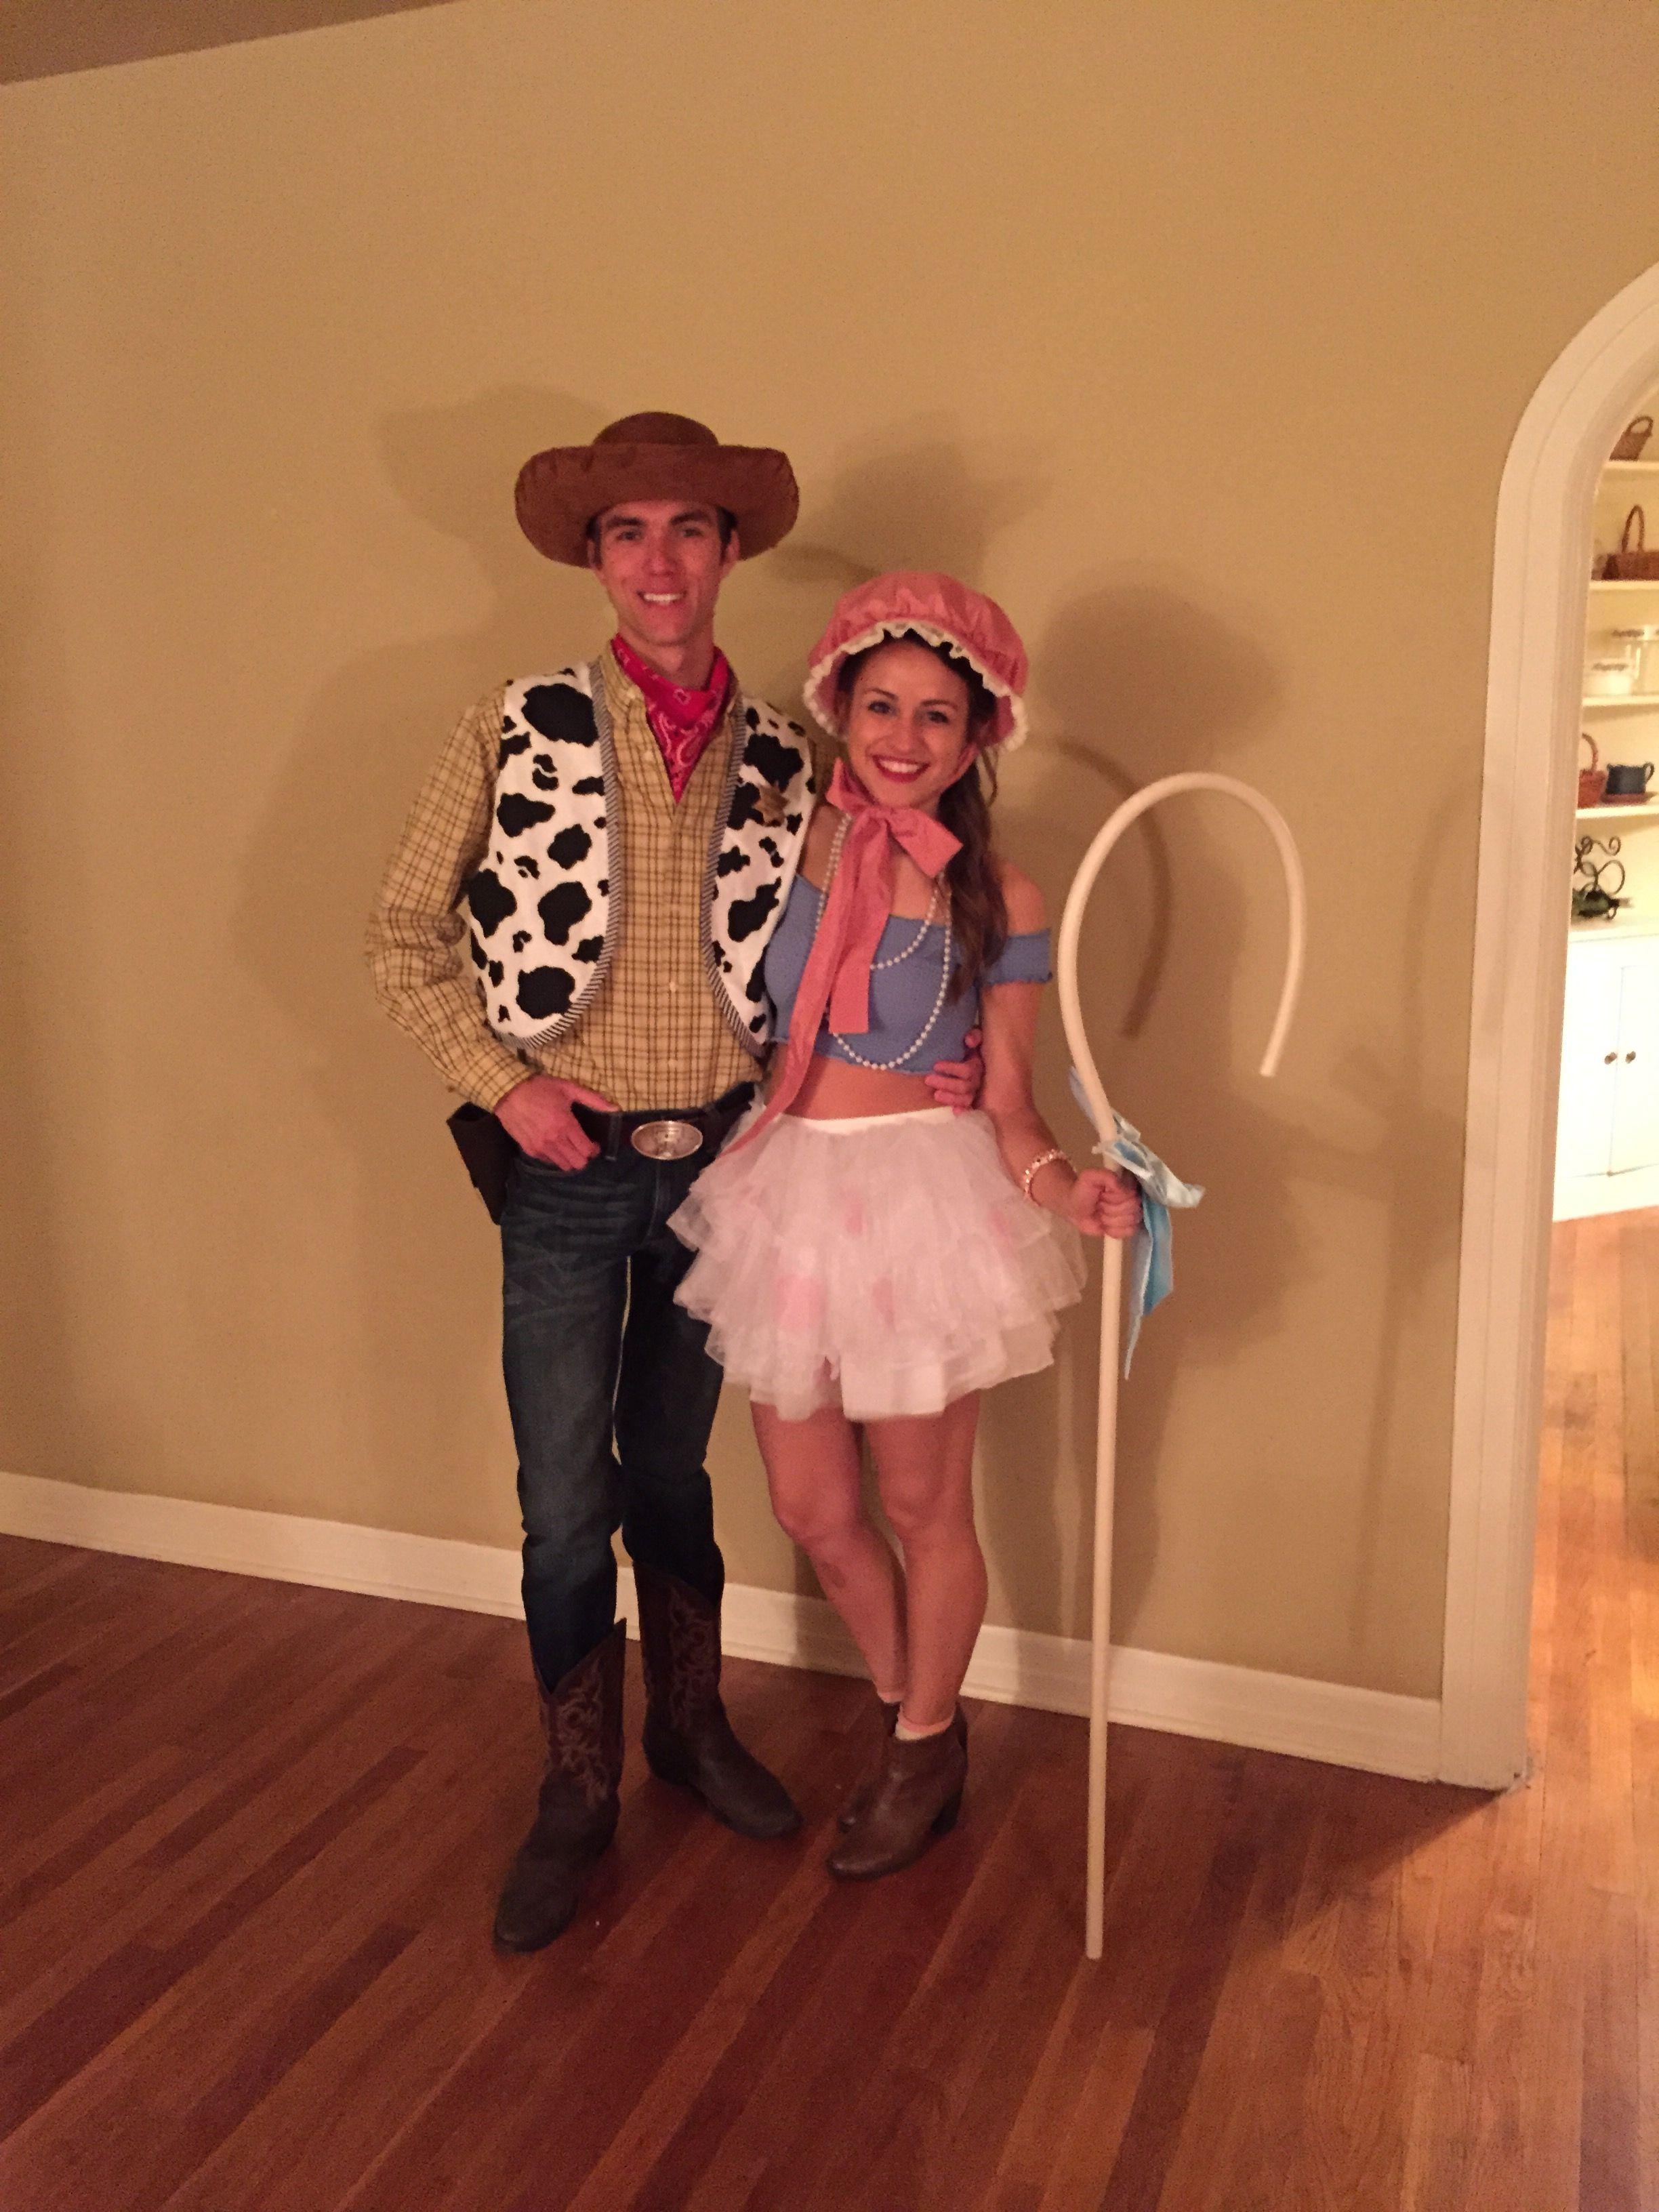 had to pin my pixar perfect halloween couple's costume! sheriff